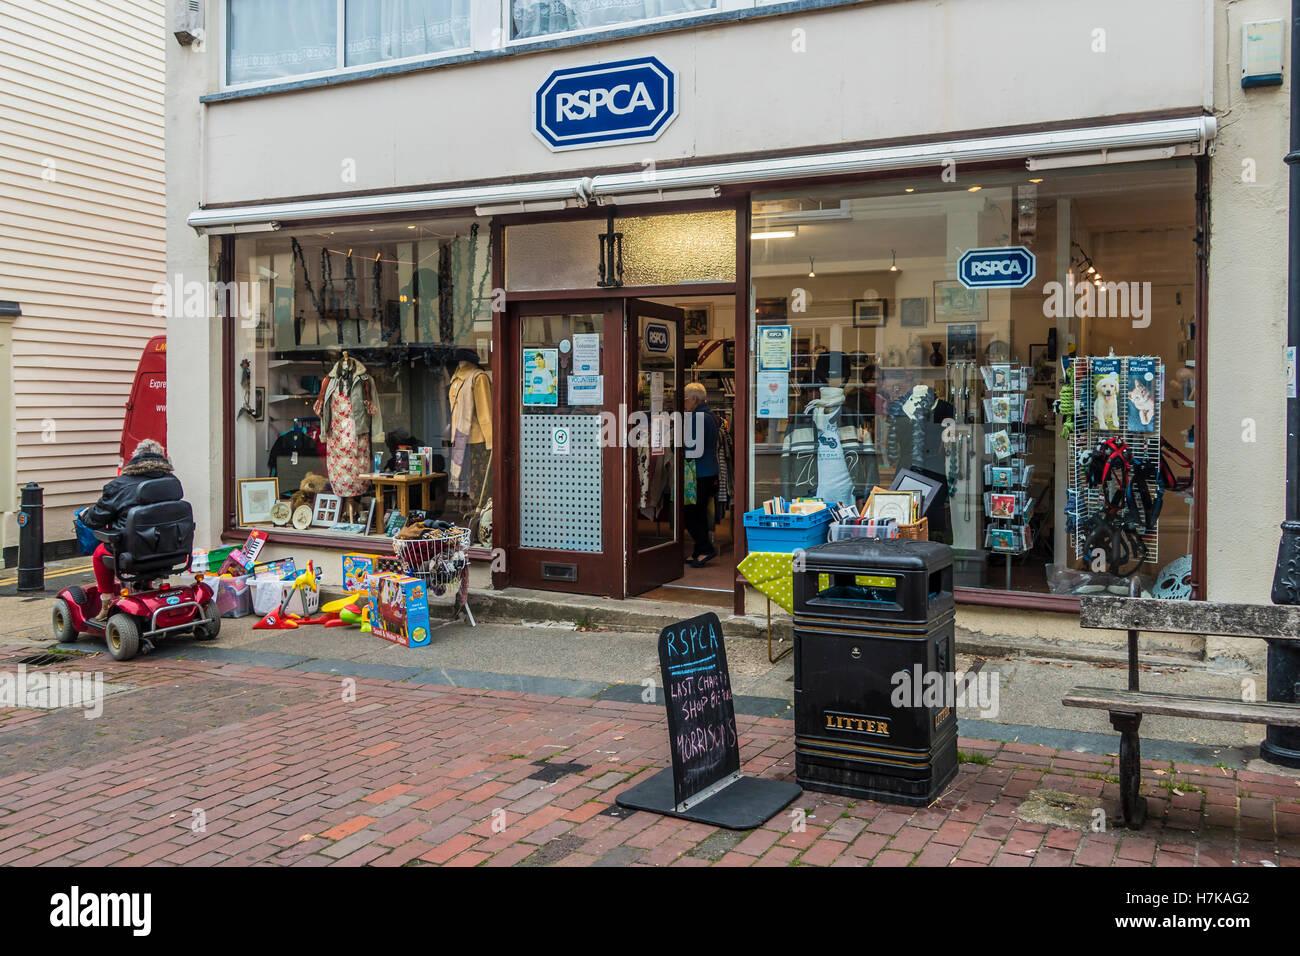 RSPCA Charity Shop Faversham Kent England - Stock Image